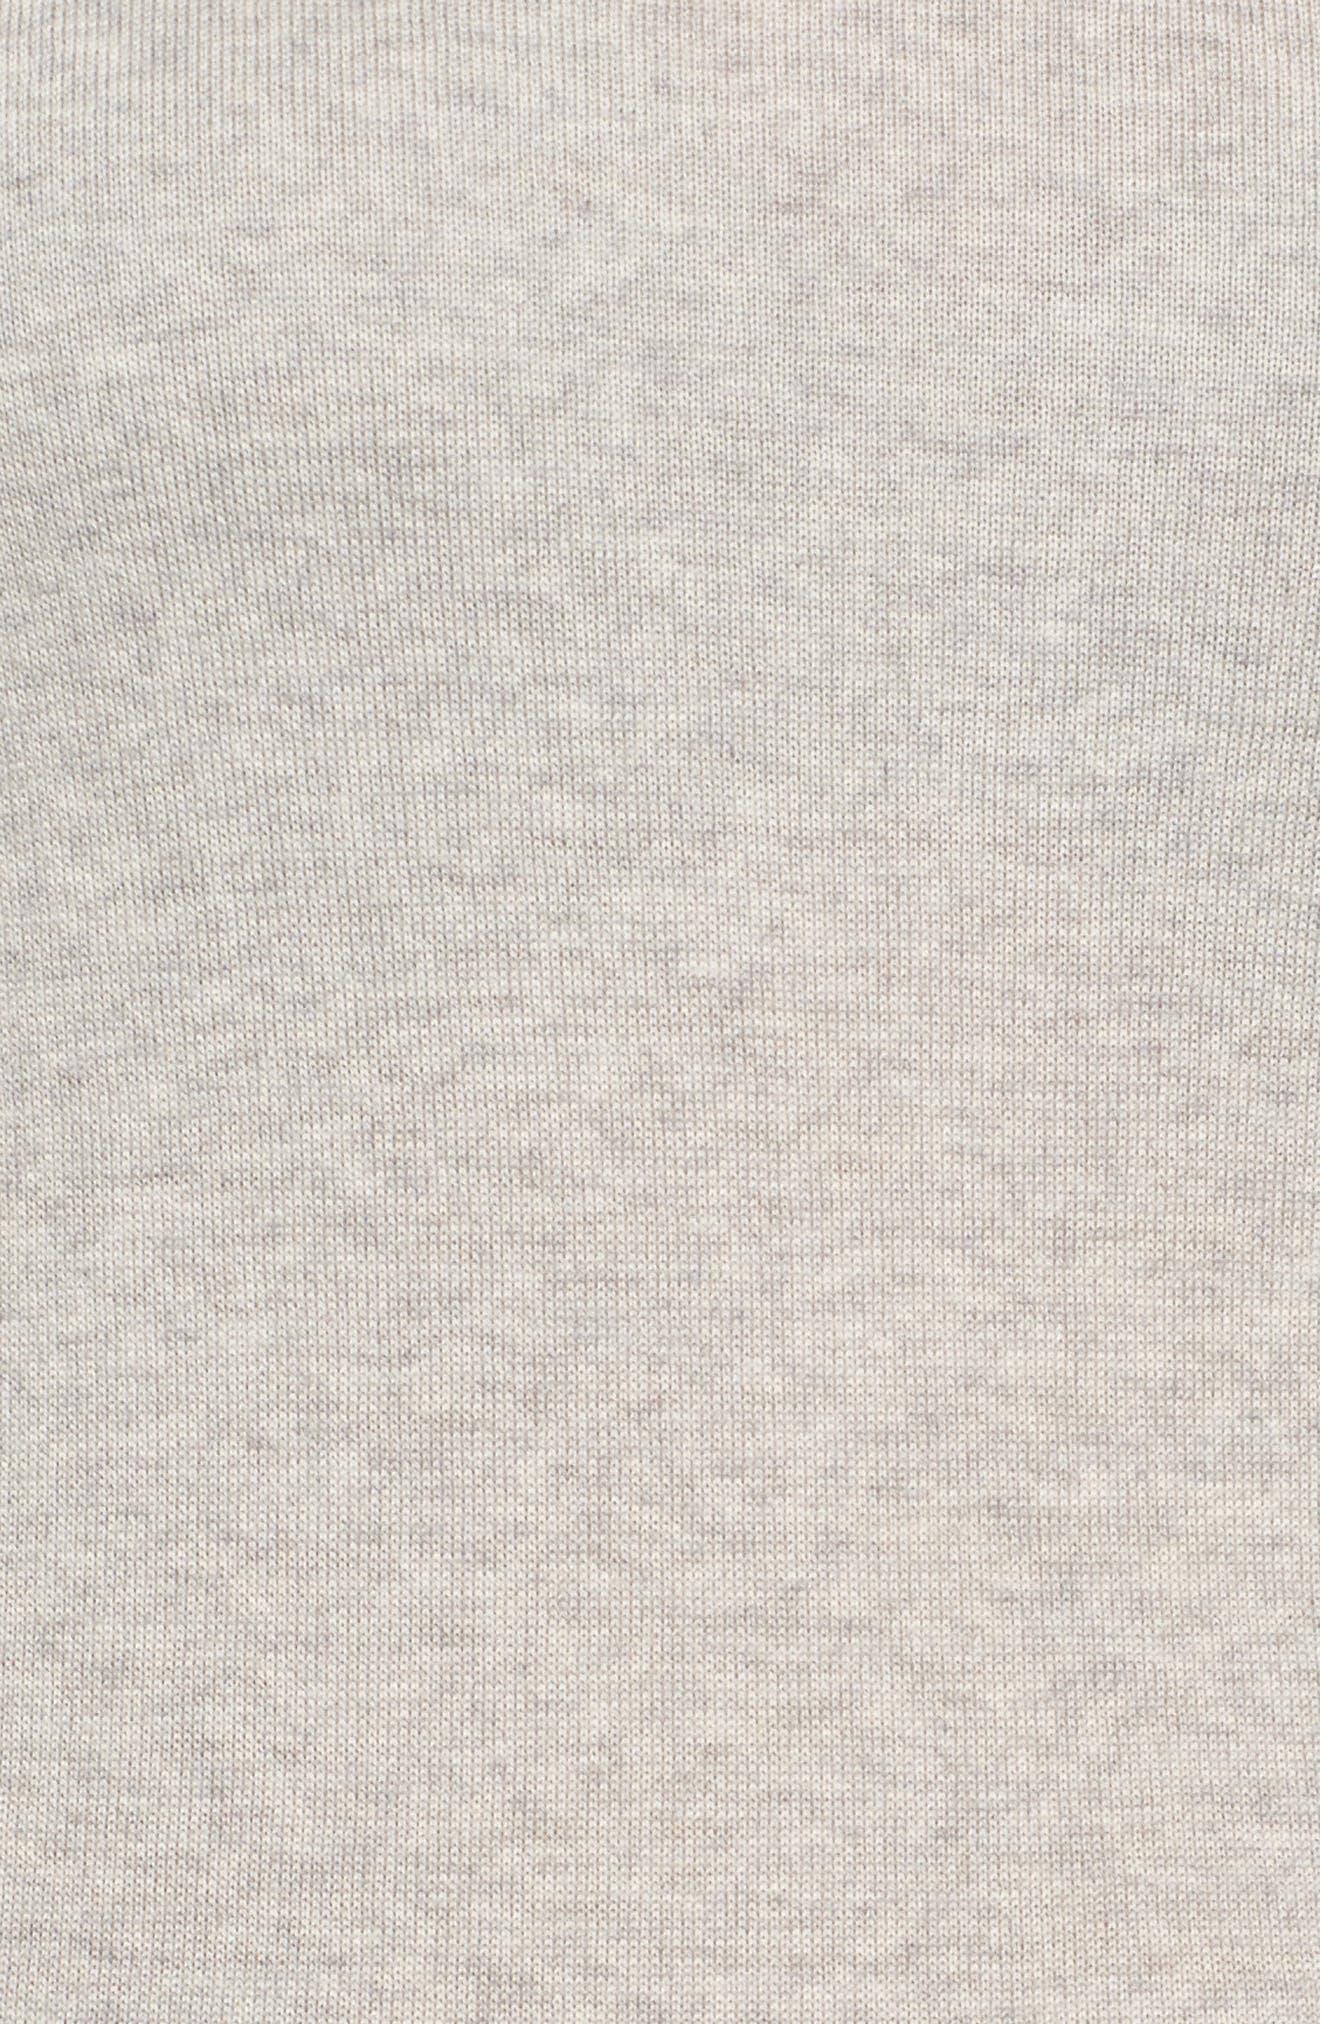 Fayme Wool Crewneck Sweater,                             Alternate thumbnail 5, color,                             Cozy Grey Melange